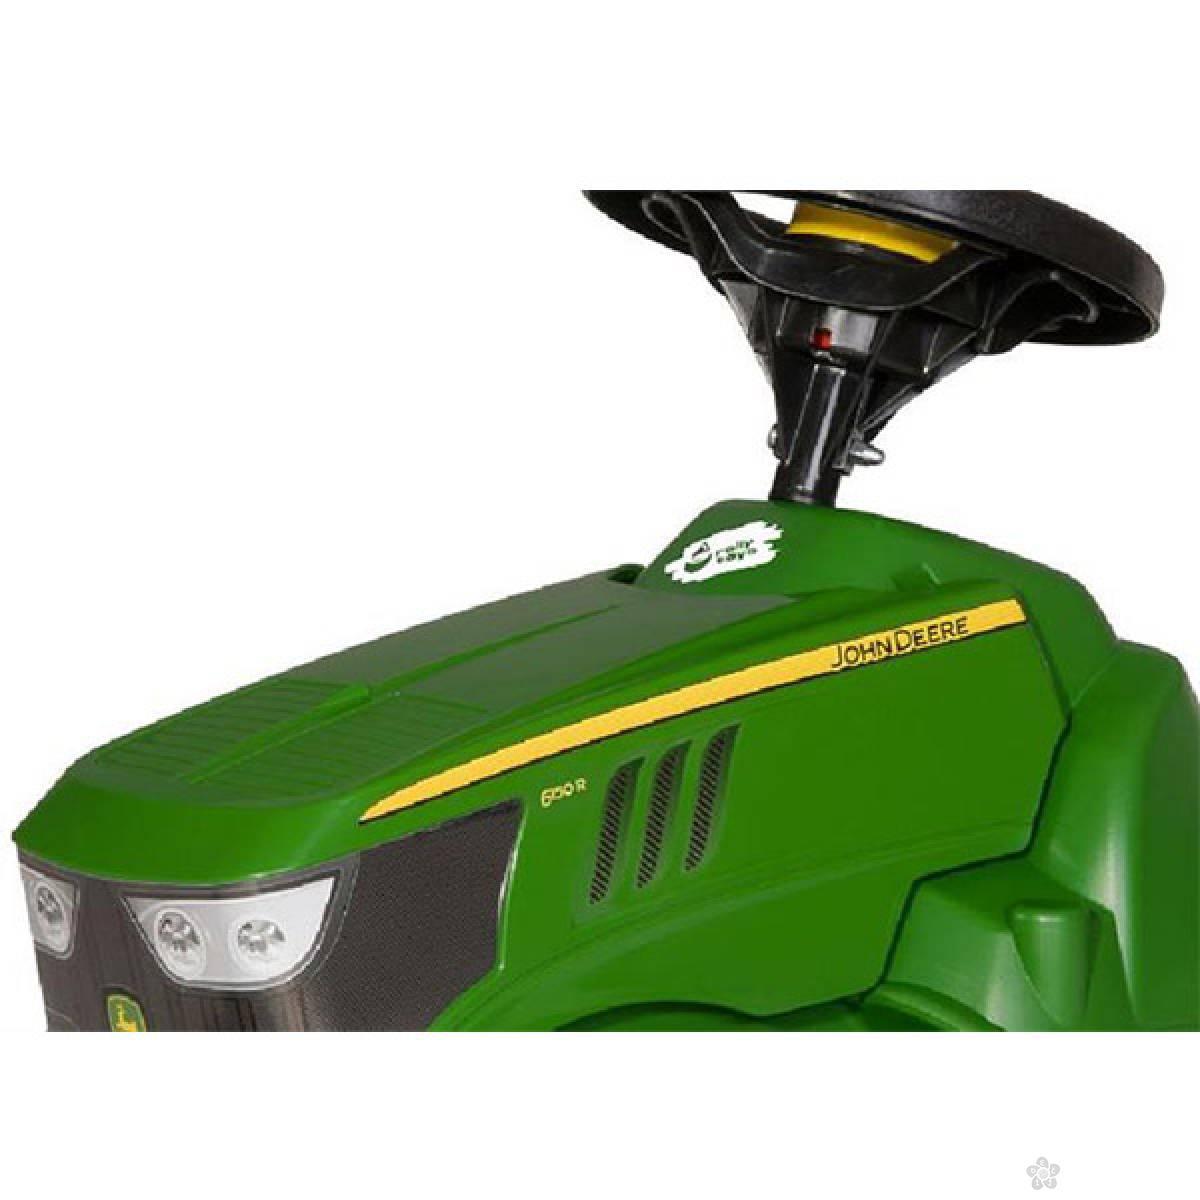 Mini Traktor Jonh Deere guralica 6150R 132072